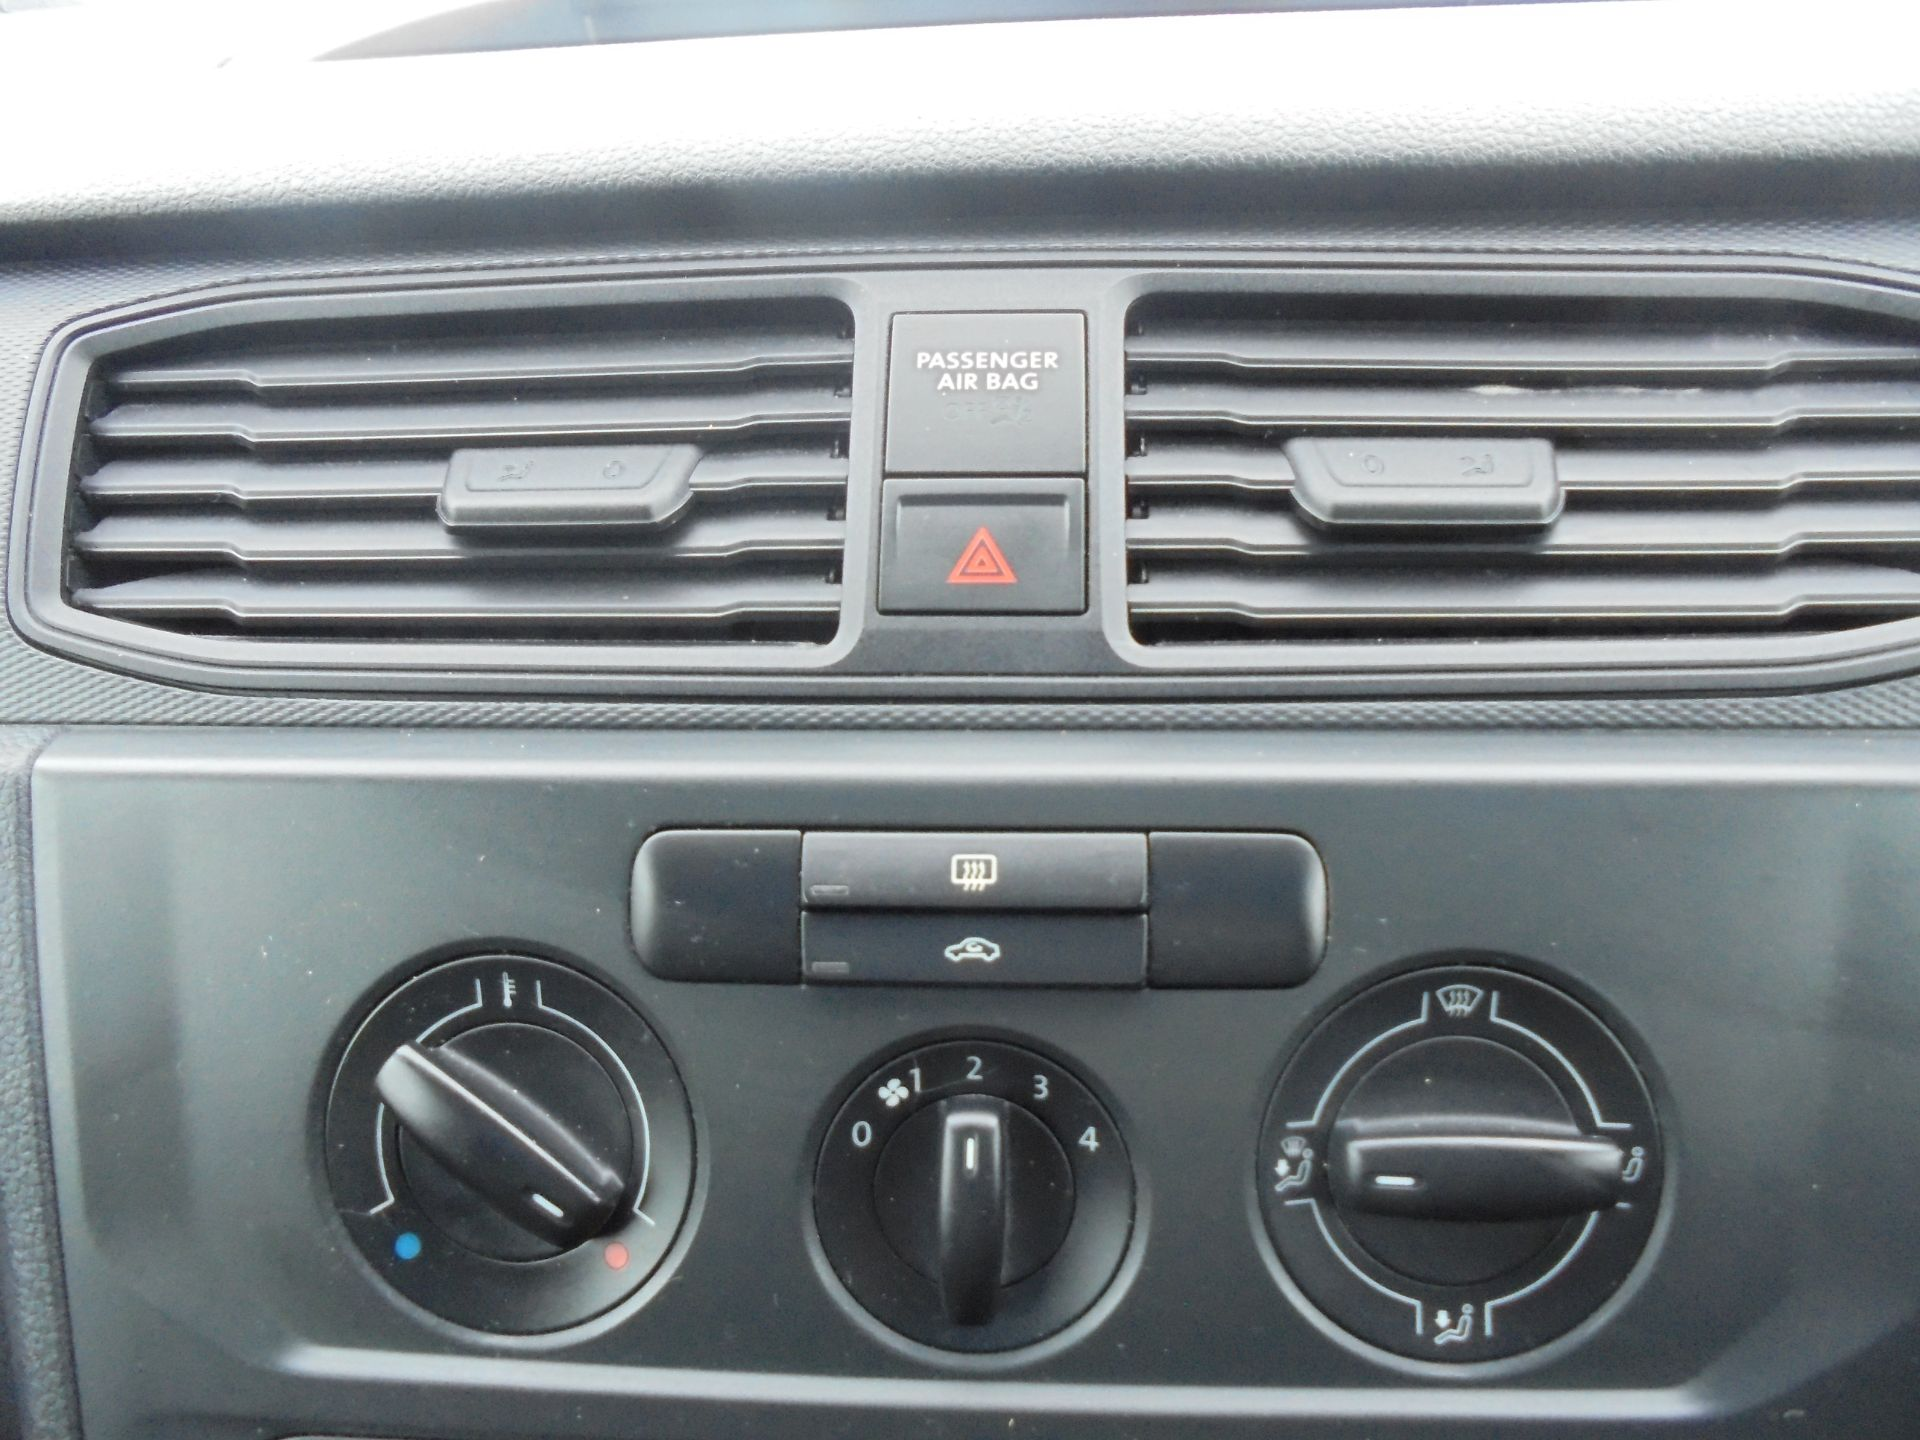 2016 Volkswagen Caddy 1.6 TDI BLUEMOTION TECH 75PS EURO 5 (GF66BZK) Image 20